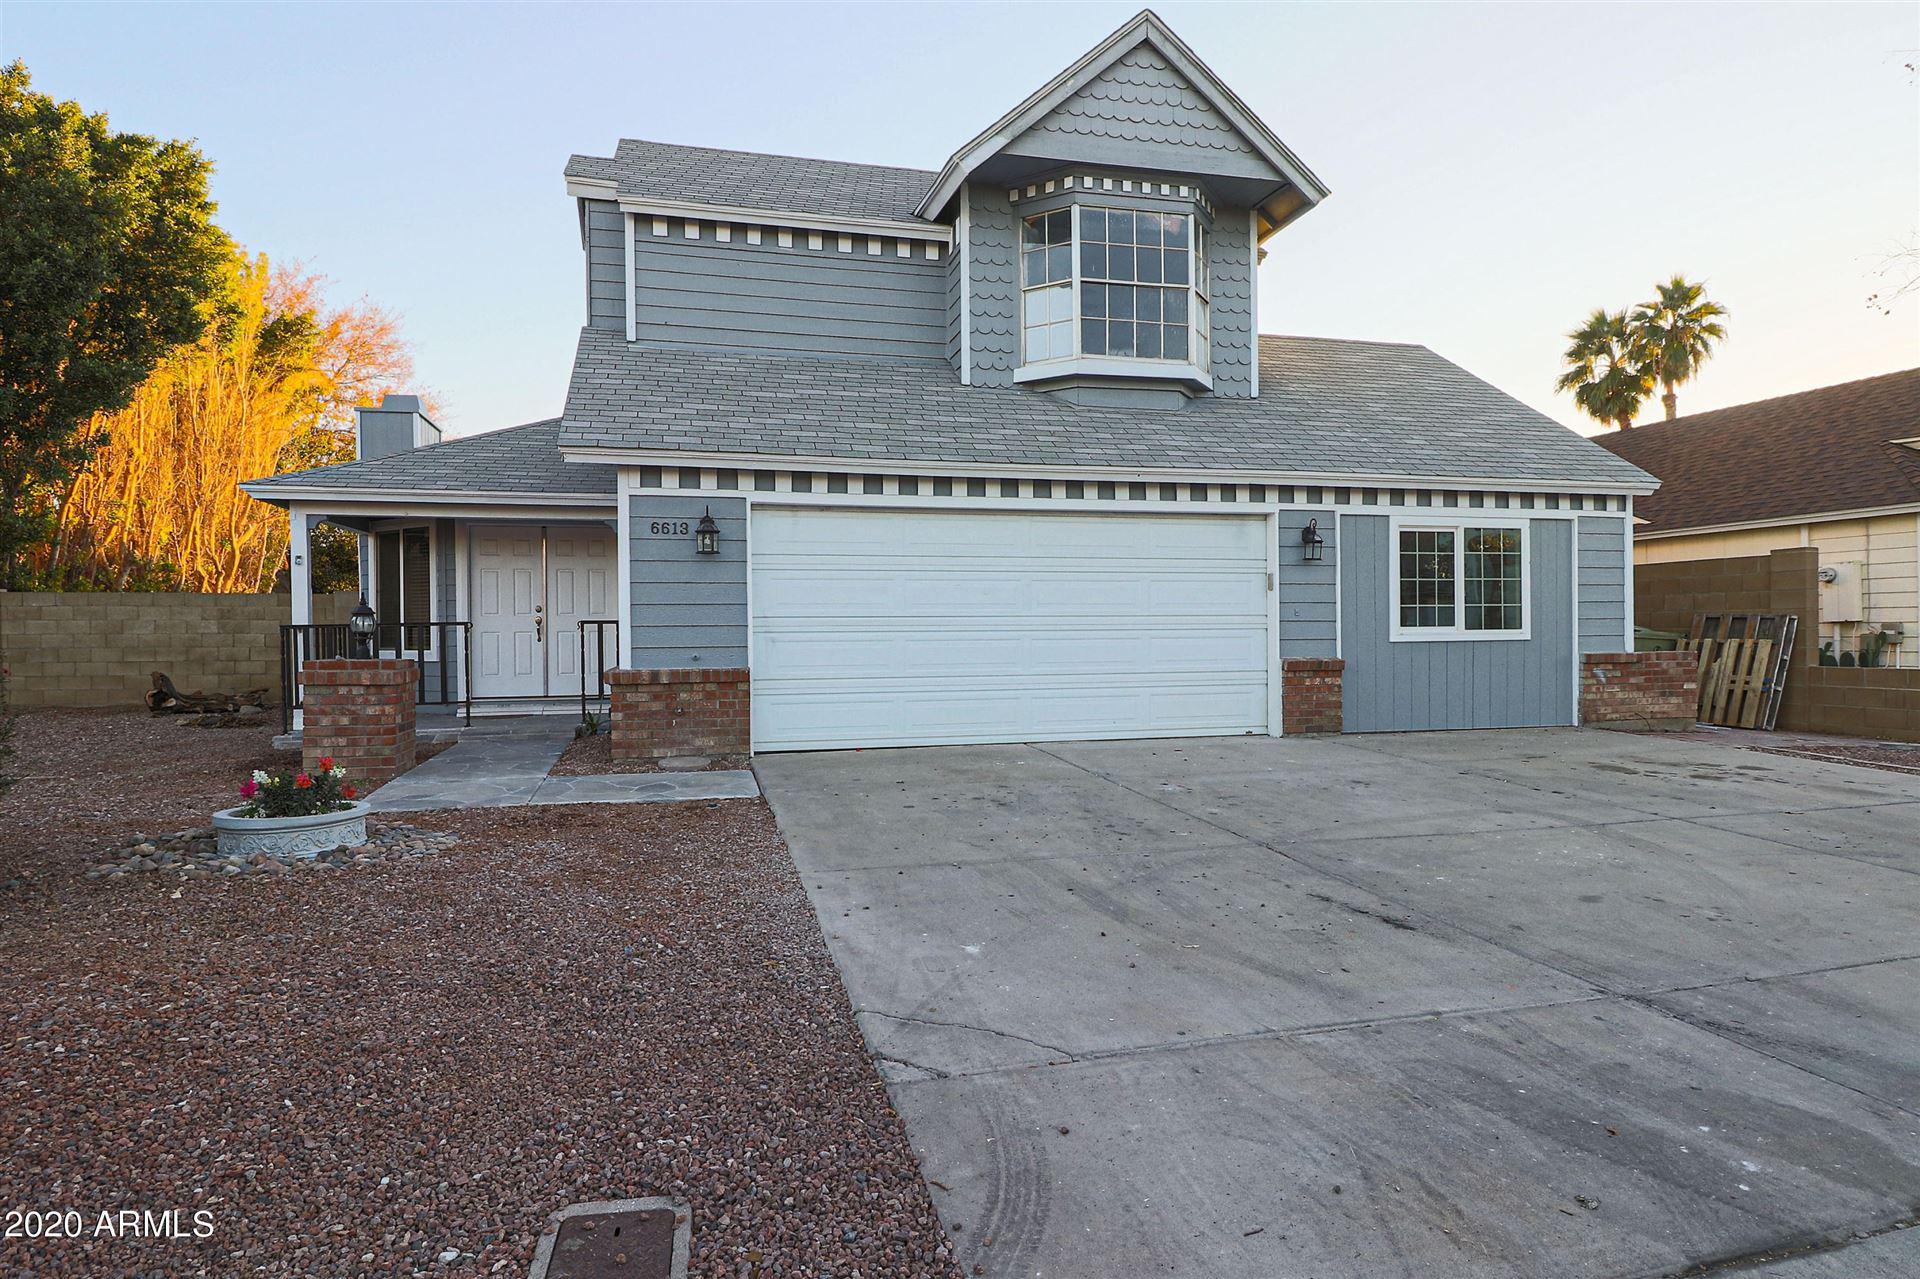 6613 W CORTEZ Street, Glendale, AZ 85304 - MLS#: 6149165